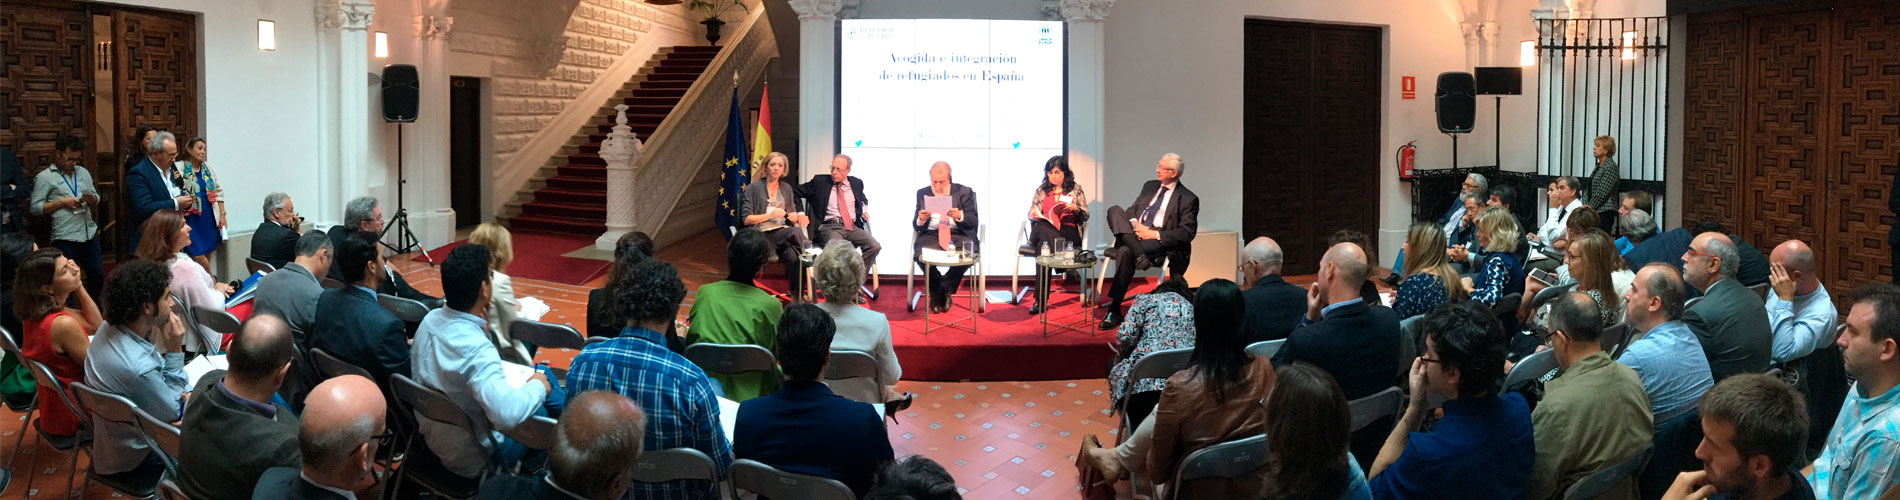 Presentación de la jornada sobre acogida e integración de refugiados en España